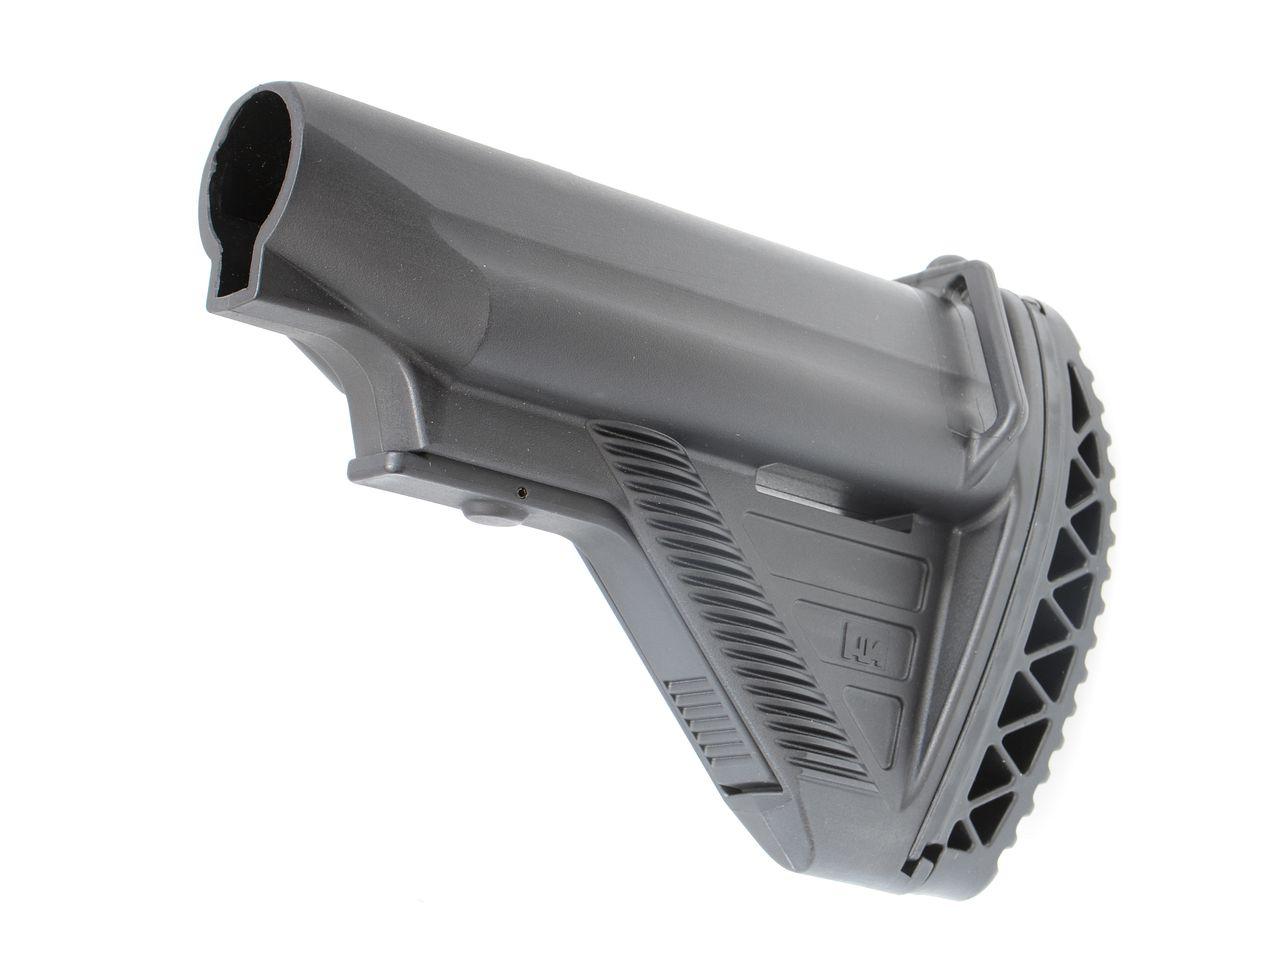 VFC/Umarex  HK416D テレスコピックストック/Convexバットキャップ